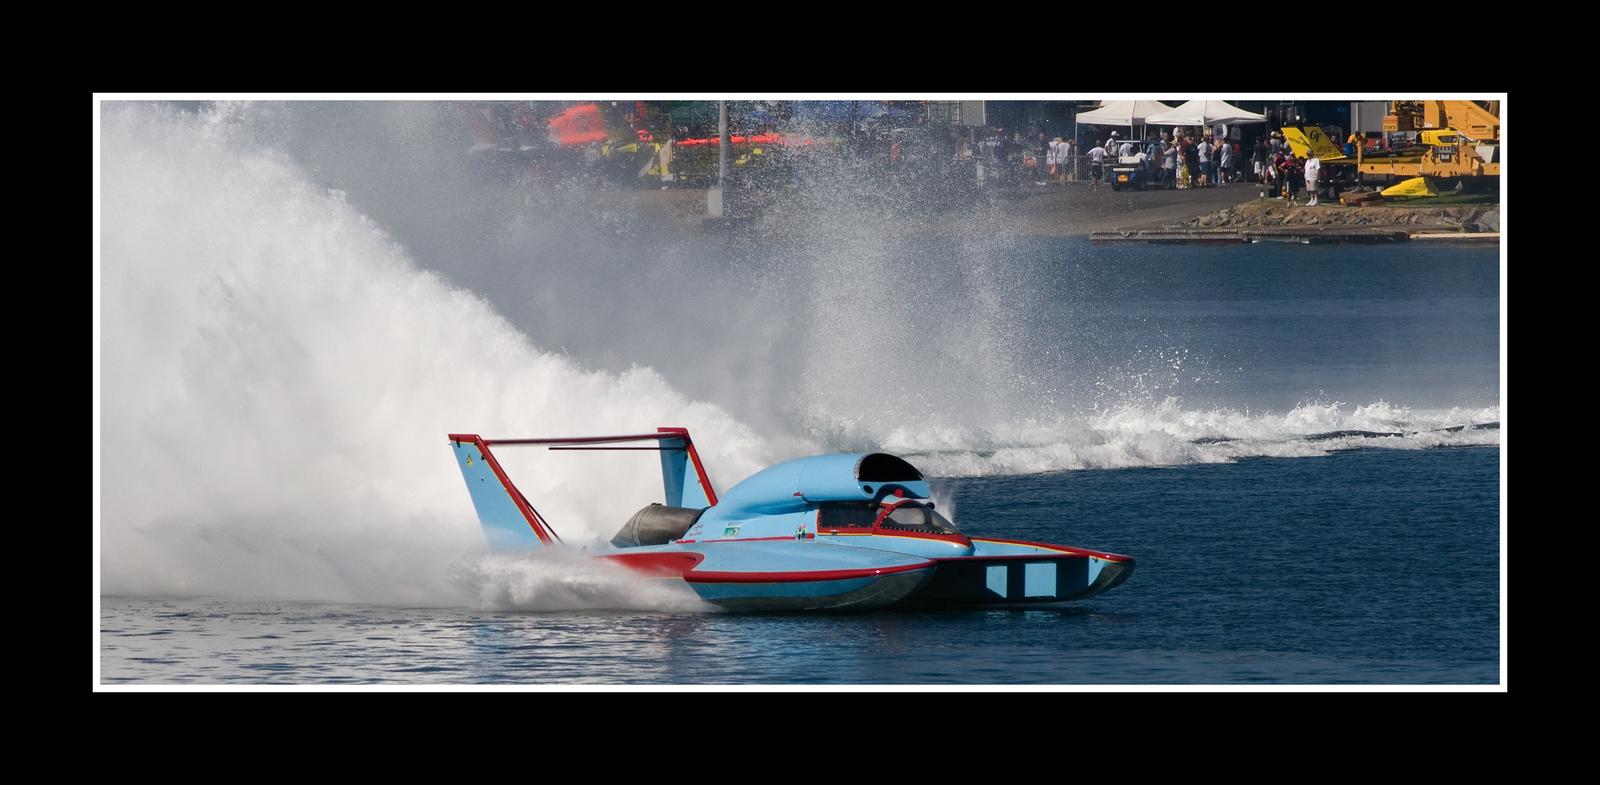 IMAGE: https://photos.smugmug.com/Sports/THUNDERBOAT-REGATTA-2007/i-rX2LCWp/0/975e3977/X3/JPEG%20Thunderboat%200547-X3.jpg